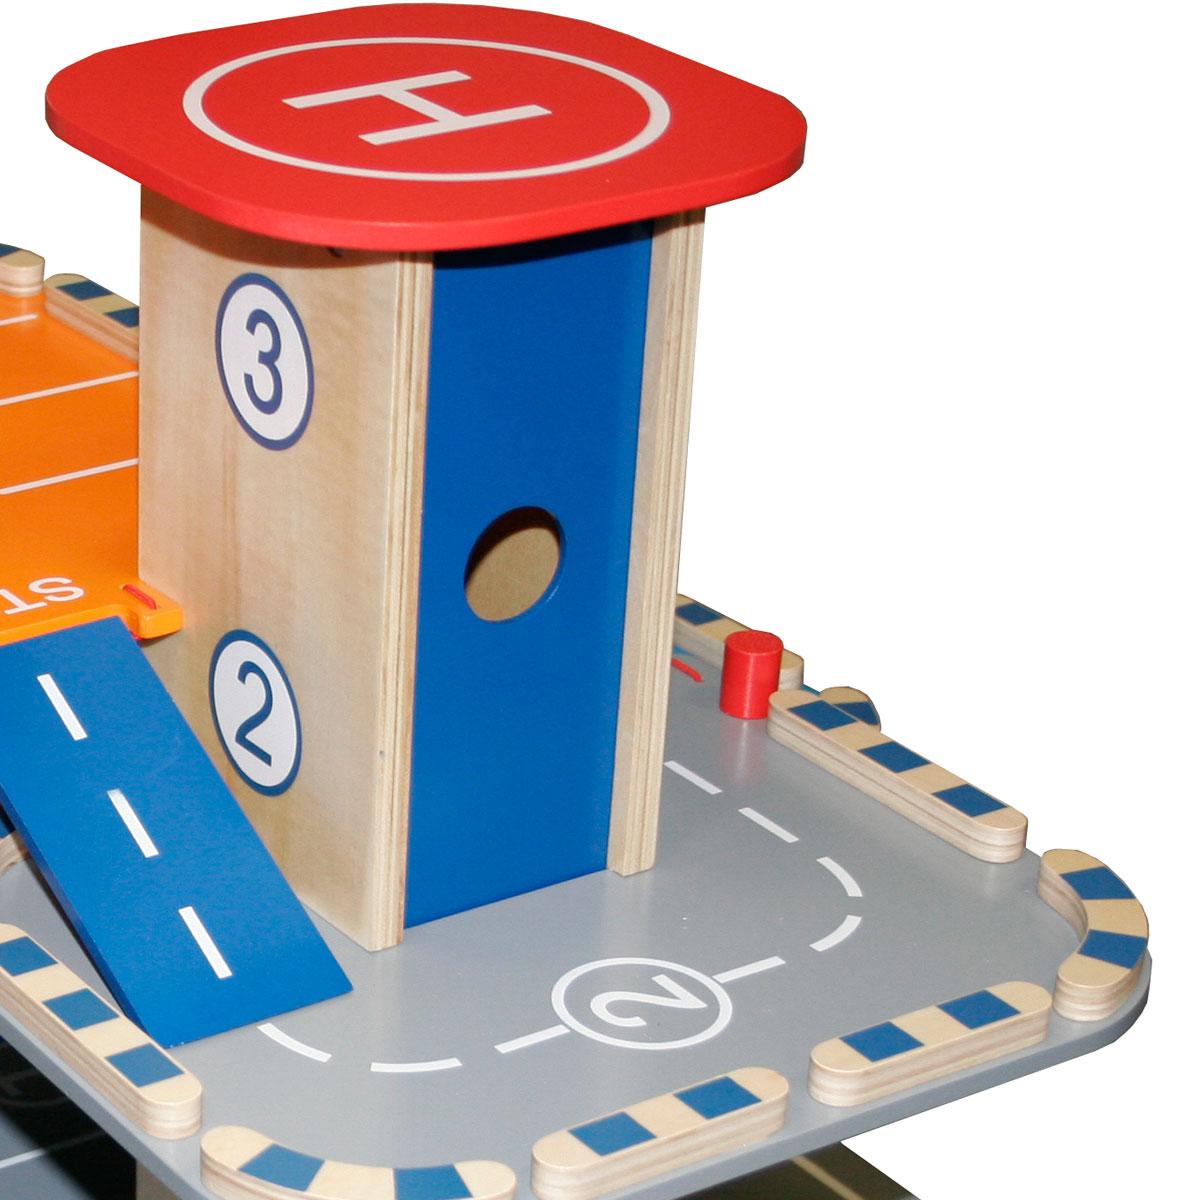 roba parkhaus aus holz mit zubeh r f r kinder ebay. Black Bedroom Furniture Sets. Home Design Ideas